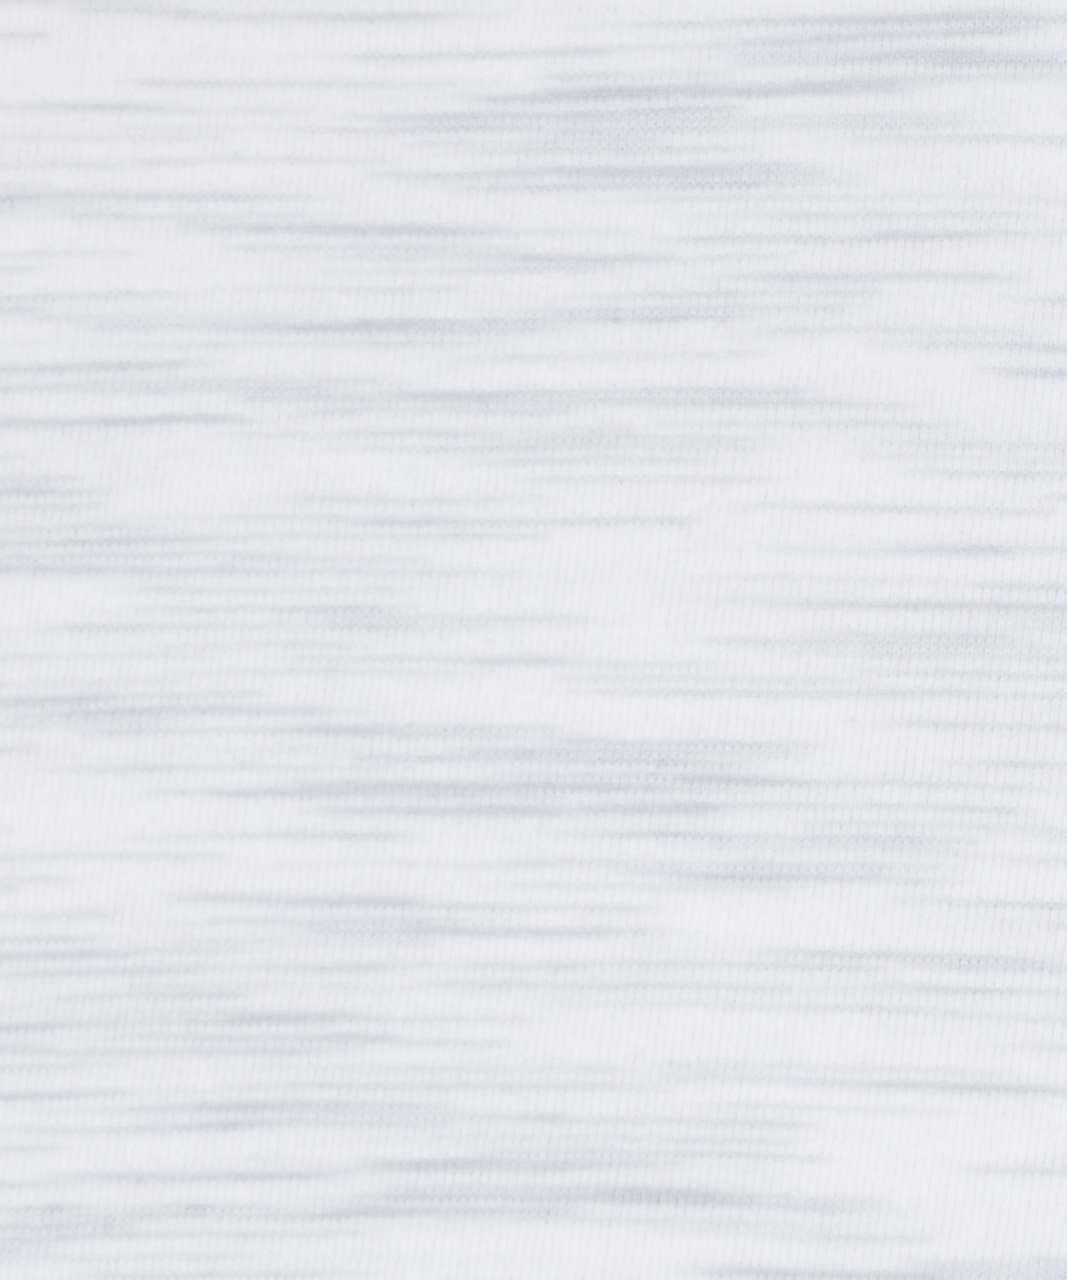 Lululemon Love Tee V - 3 Colour Space Dye Ice Grey Alpine White